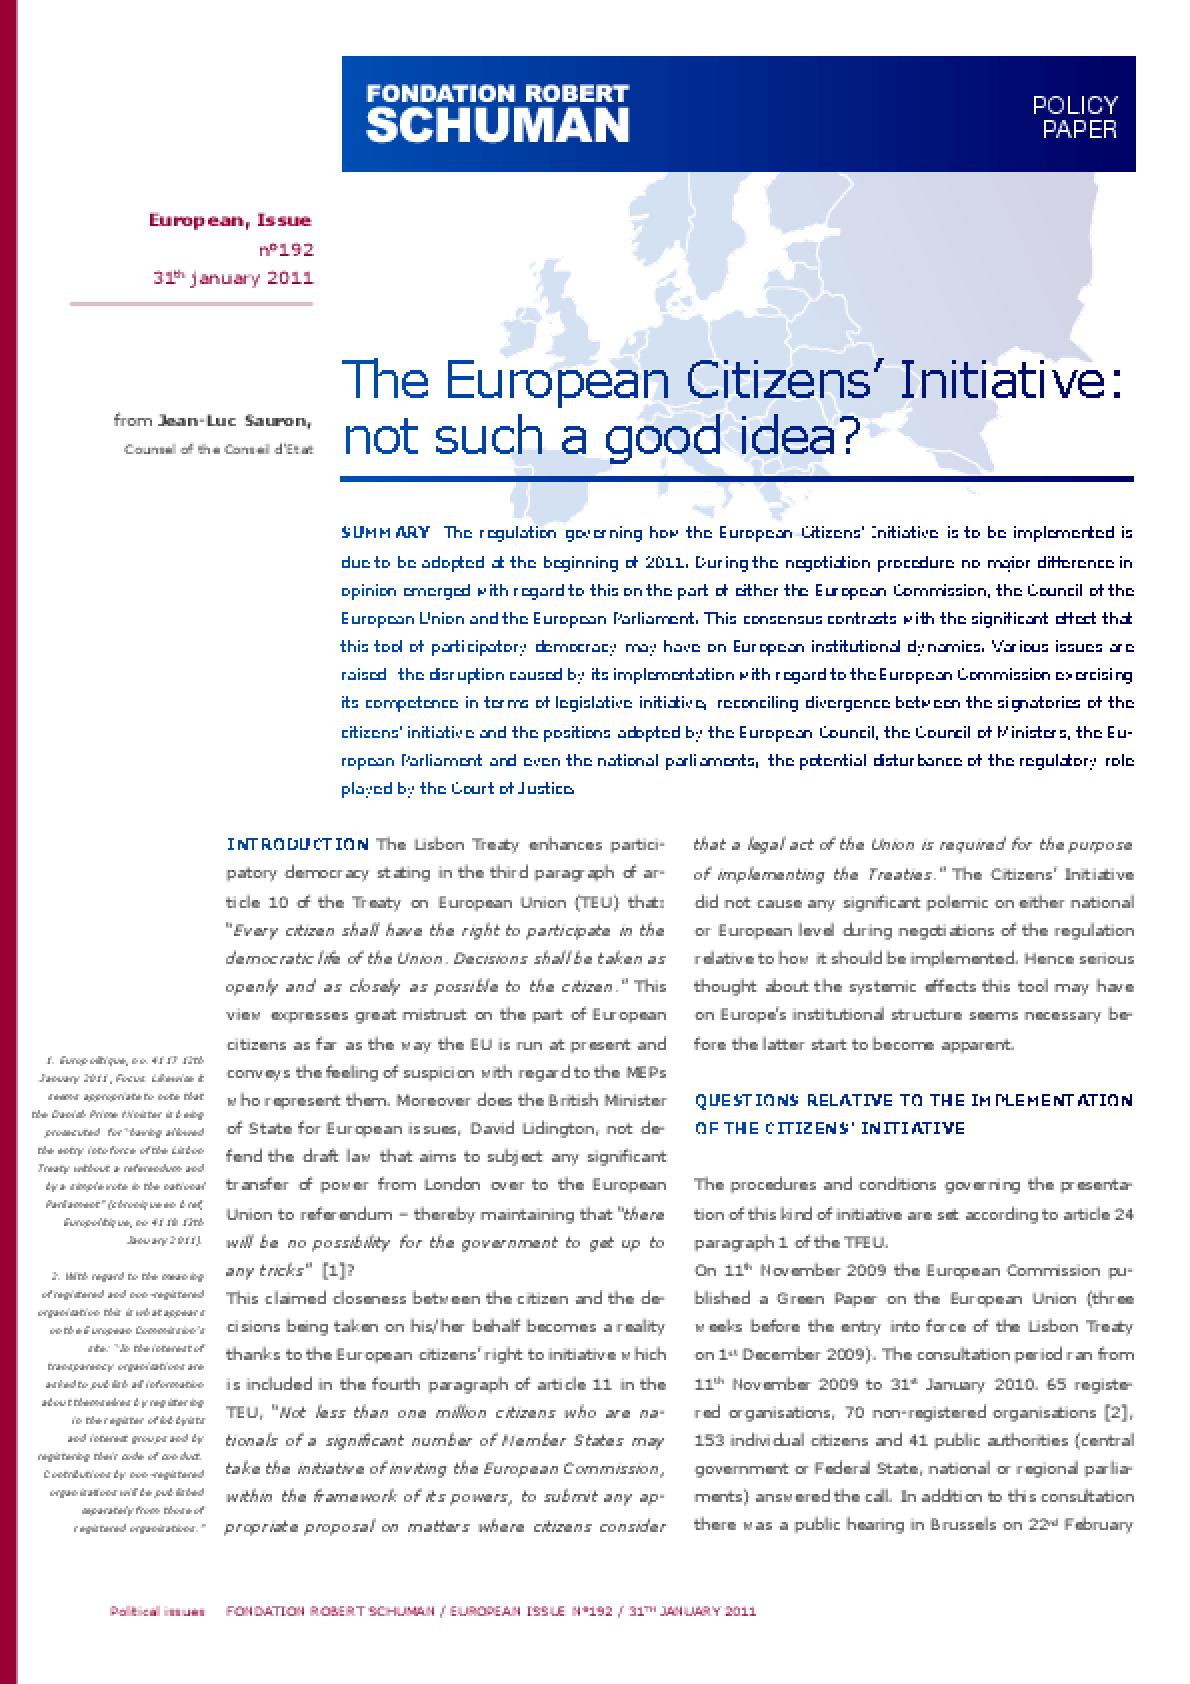 The European Citizens' Initiative: Not Such a Good Idea